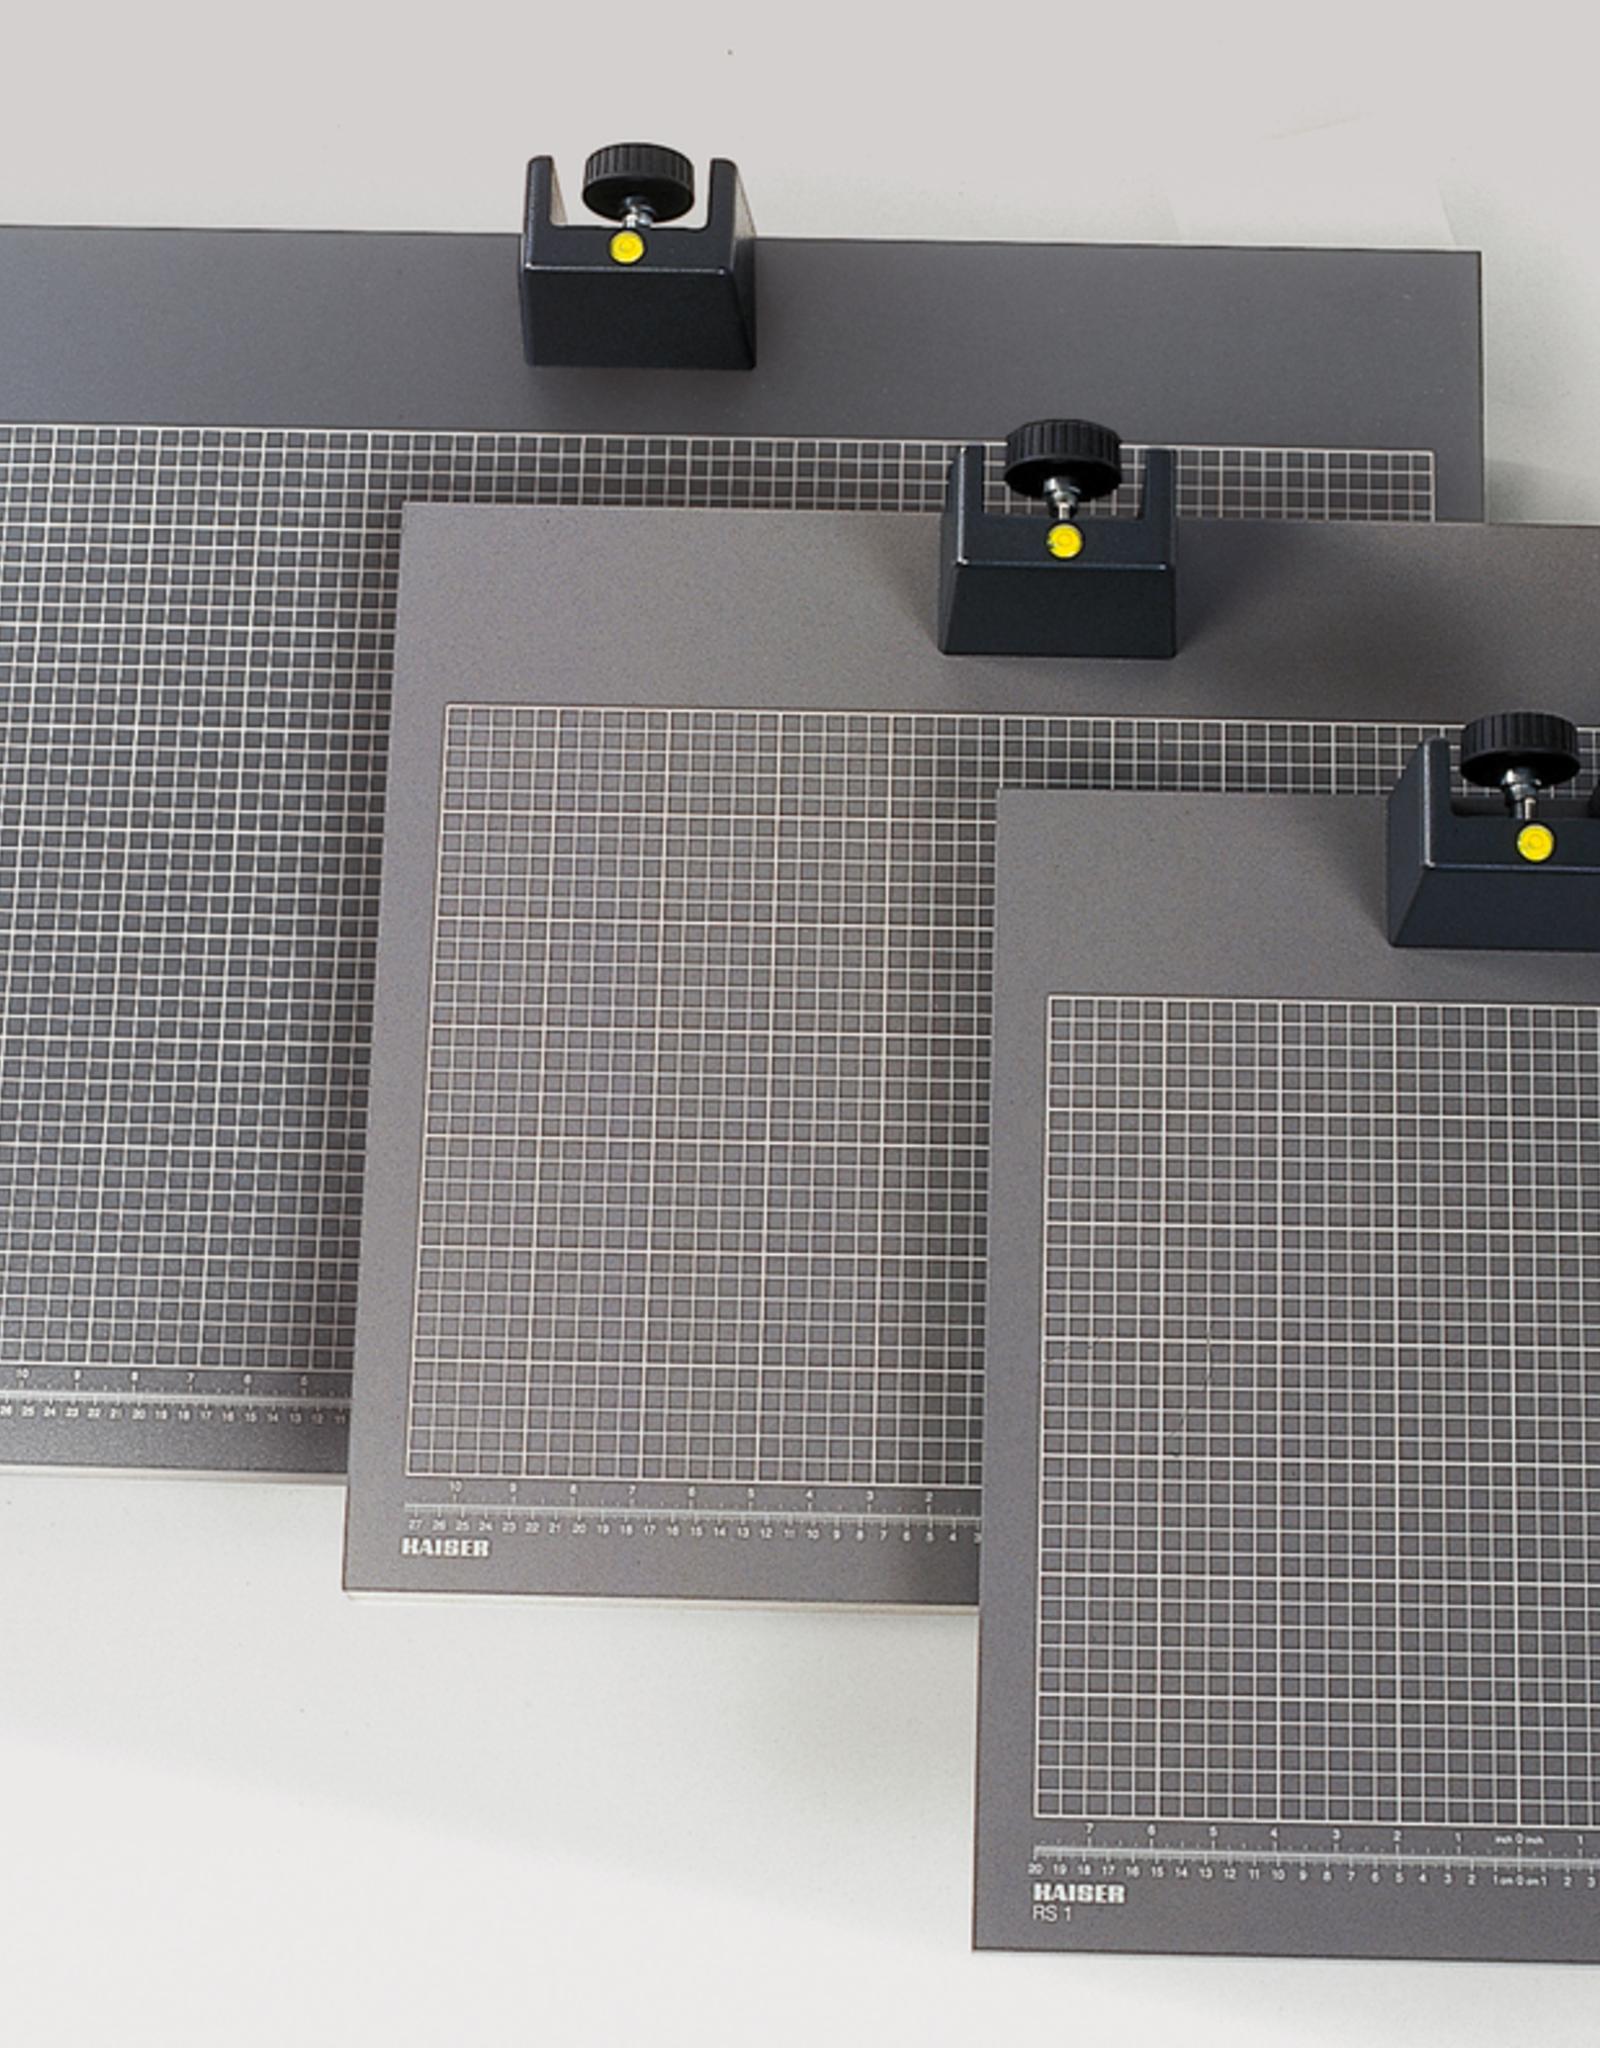 Kaiser Kaiser Copy Base Board (M) with socket and adjustable feet